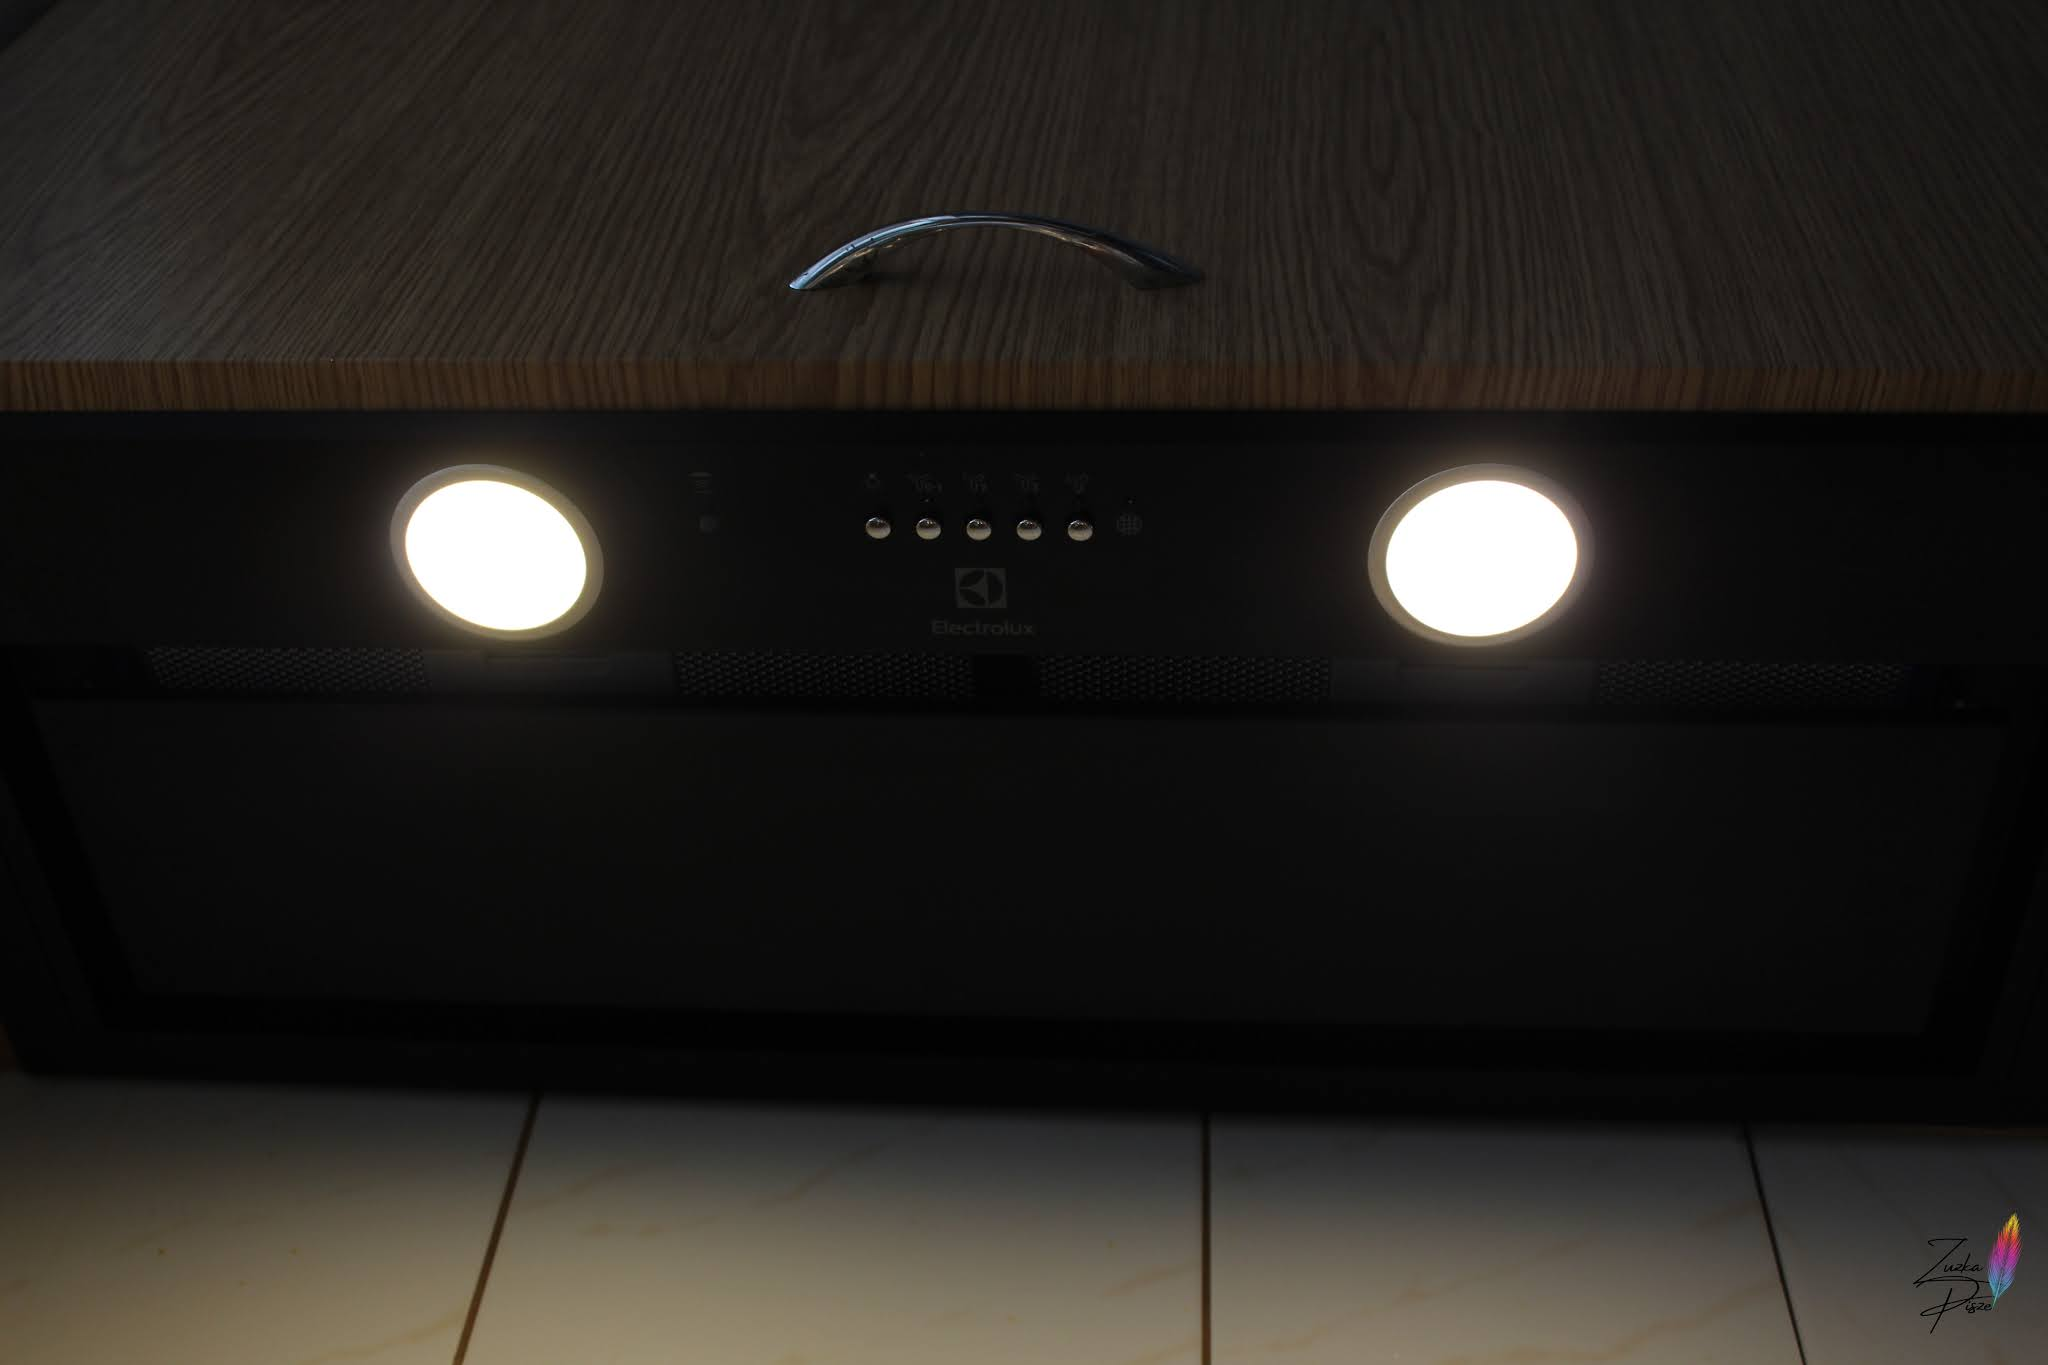 Electrolux LFG719R Okap zintegrowany seria 700 - recenzja